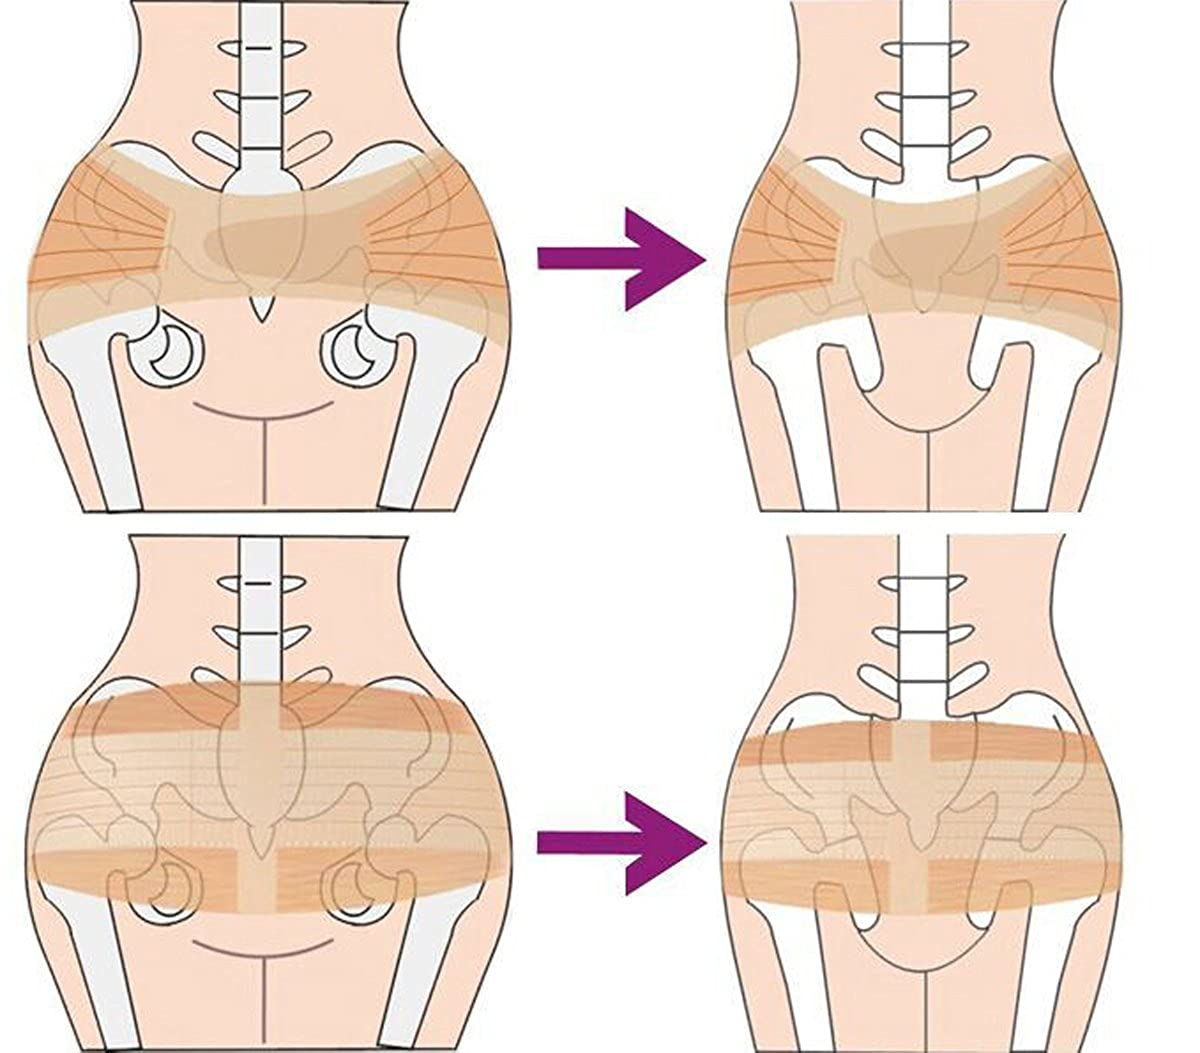 XL Aivtalk Womens Hip Shaper Pelvis Support Belt Hip Sacroiliac Pain Relief Correct Brace Binder Band Postpartum Recovery Pelvis Belt Maternity